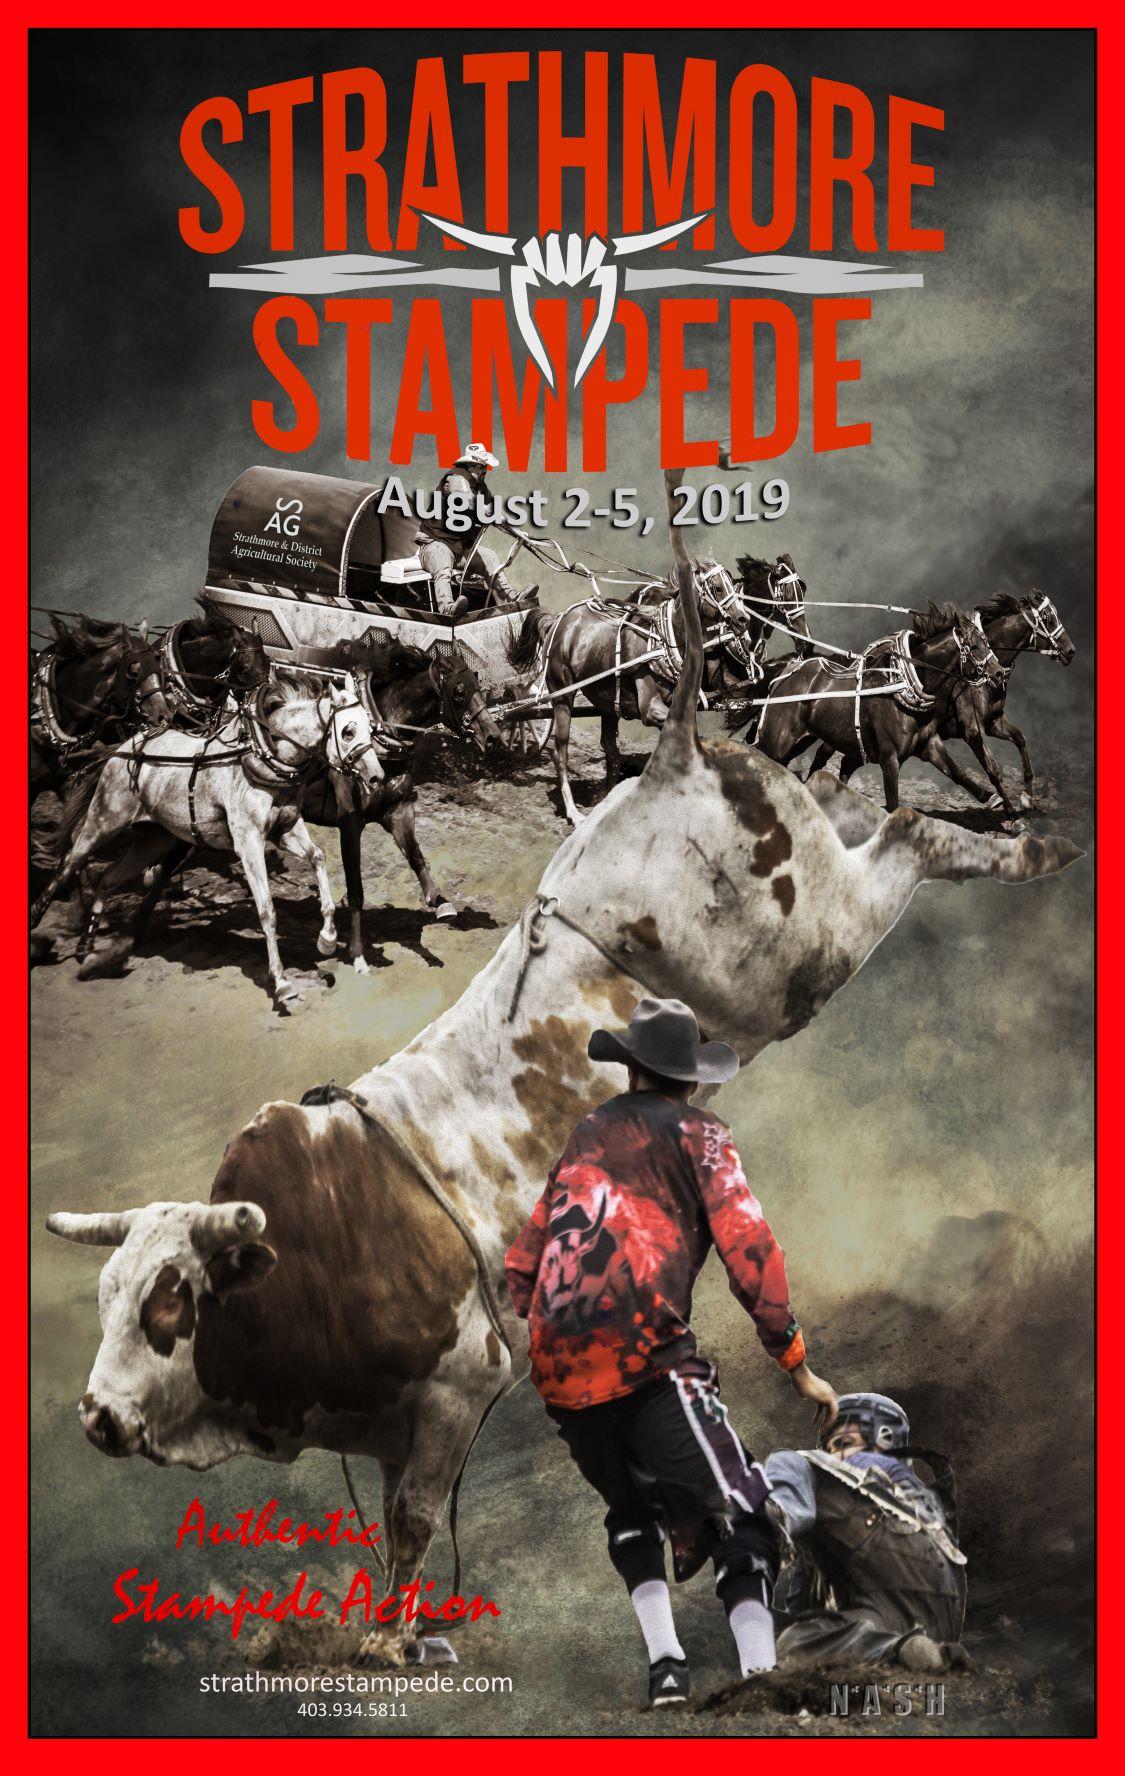 Strathmore Stampede poster 2019  m.jpg